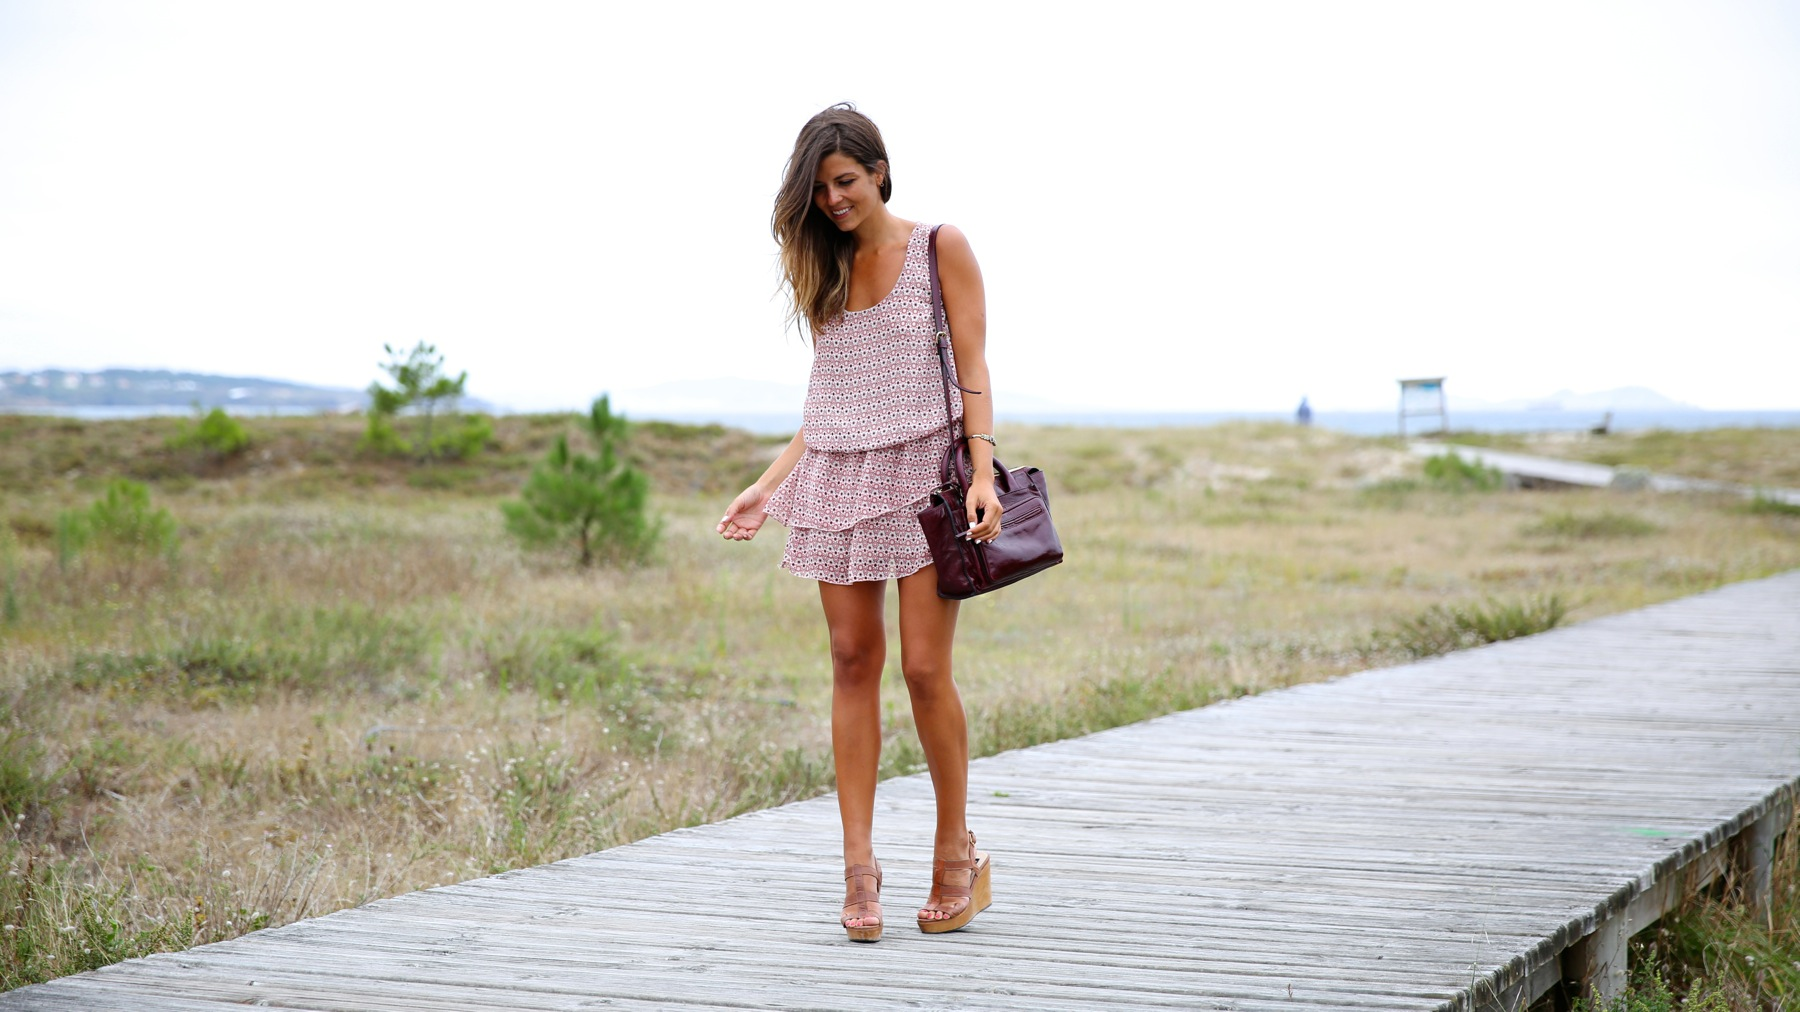 trendy_taste-look-outfit-street_style-ootd-blog-blogger-fashion_spain-moda_españa-boho-beach-playa-galicia-vestido-dress-sandalias-sandals-8